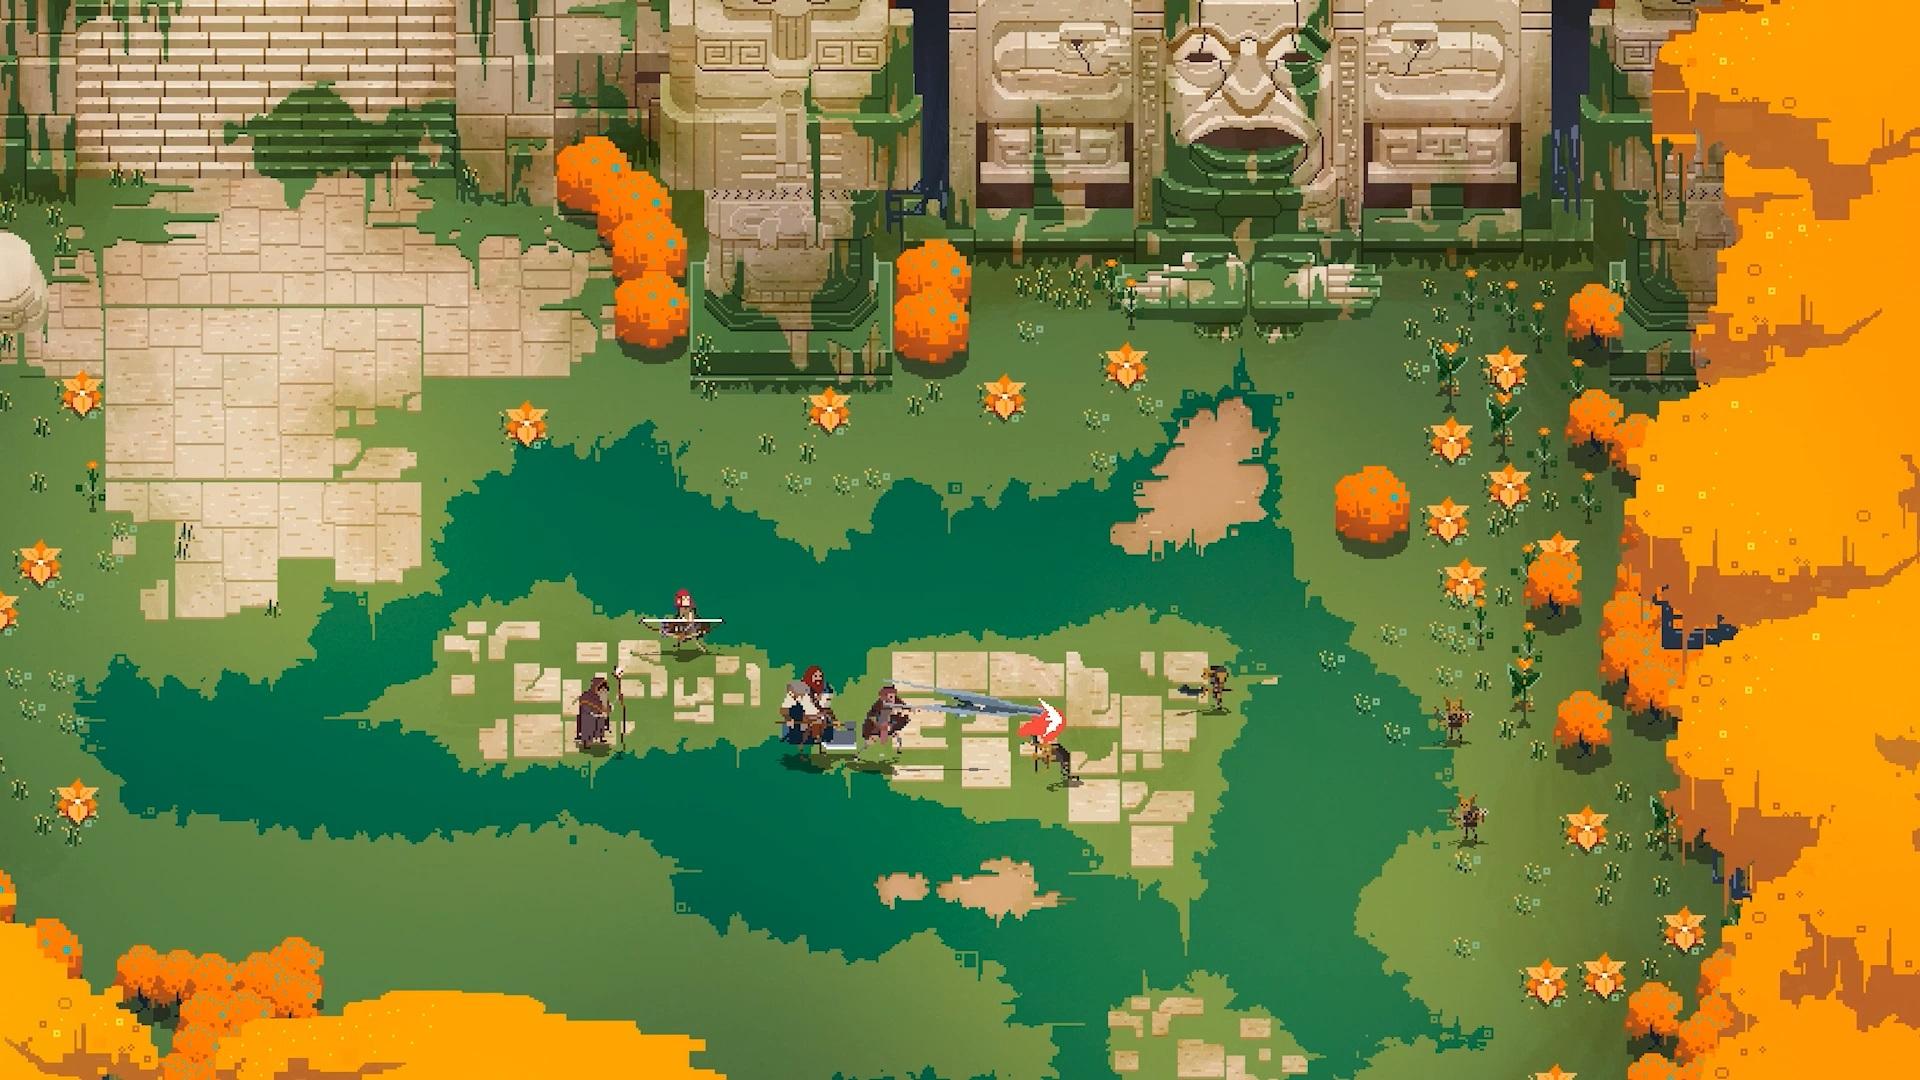 Pixel Games - Armor Games